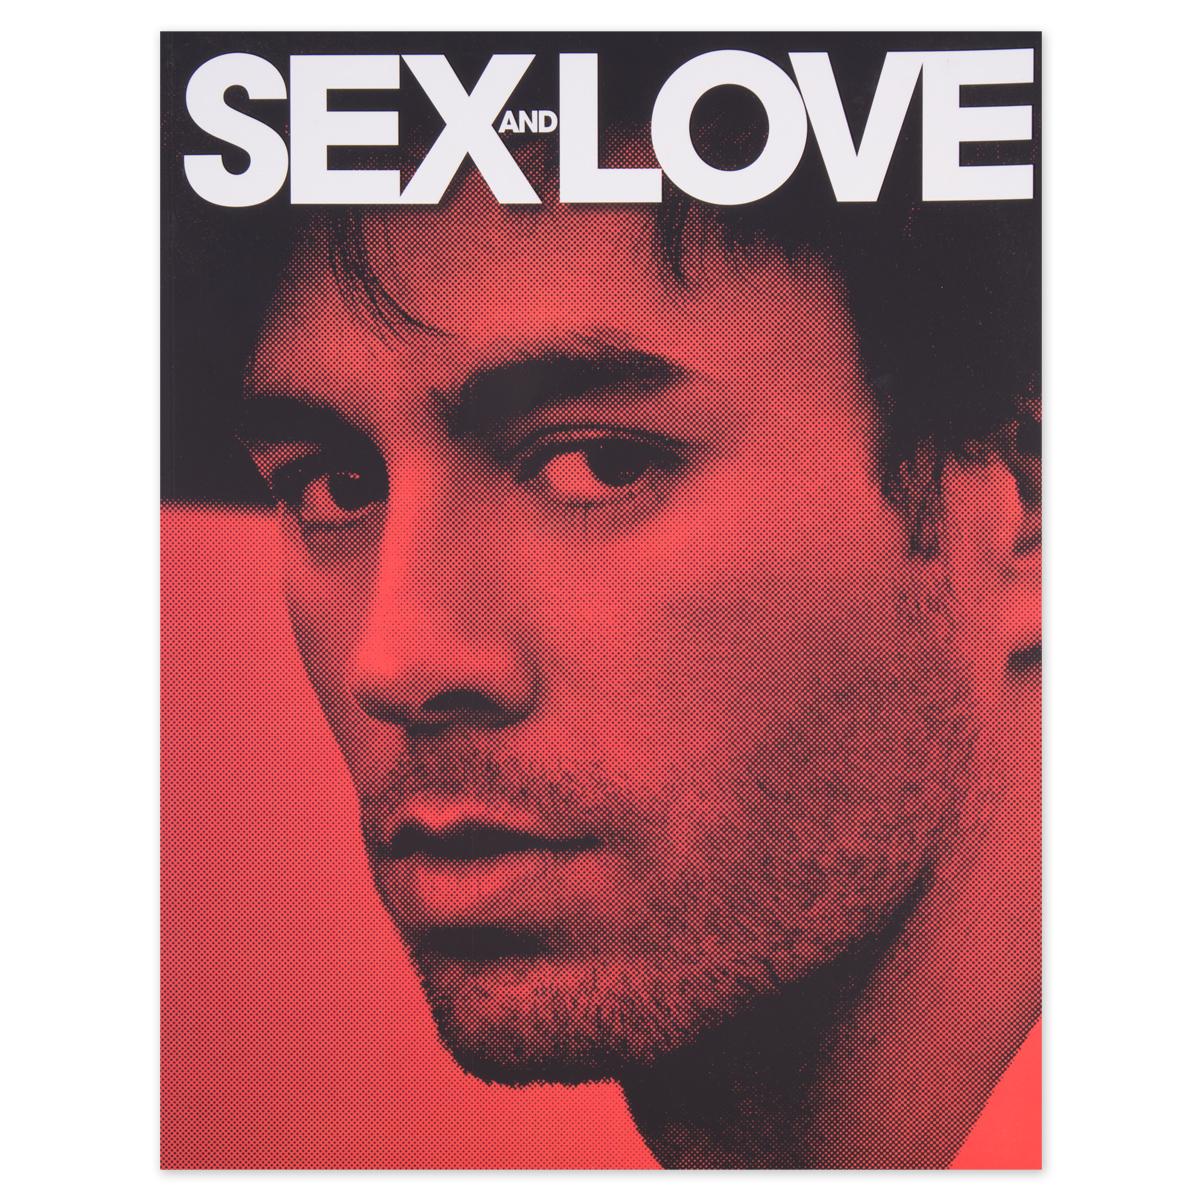 enrique iglesias sex and love video songs download in Ballarat